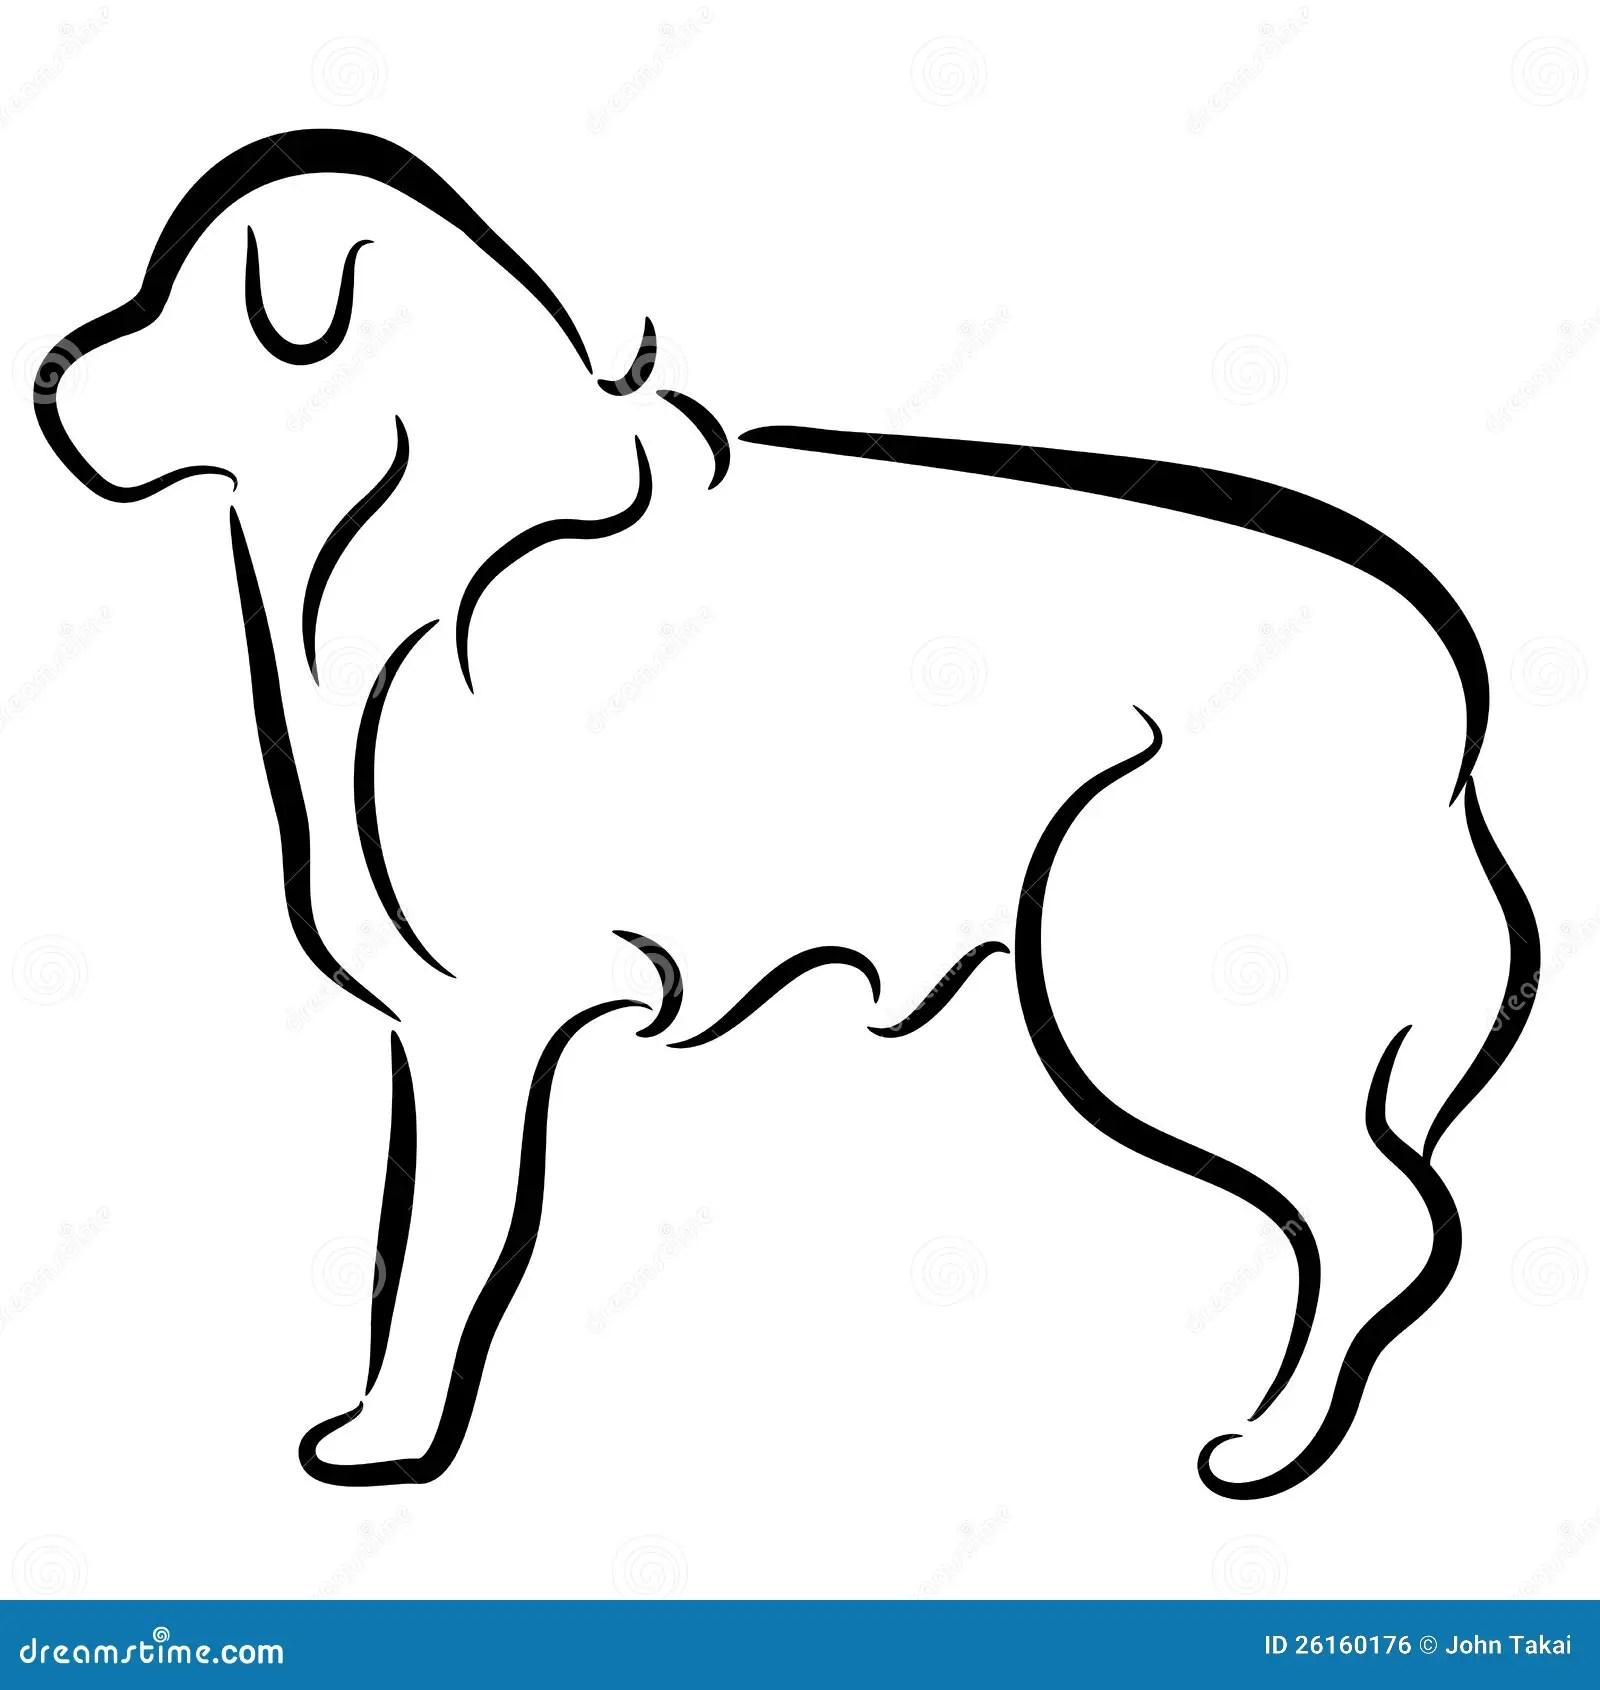 Abstract Elegant Border Collie Dog Profile Stock